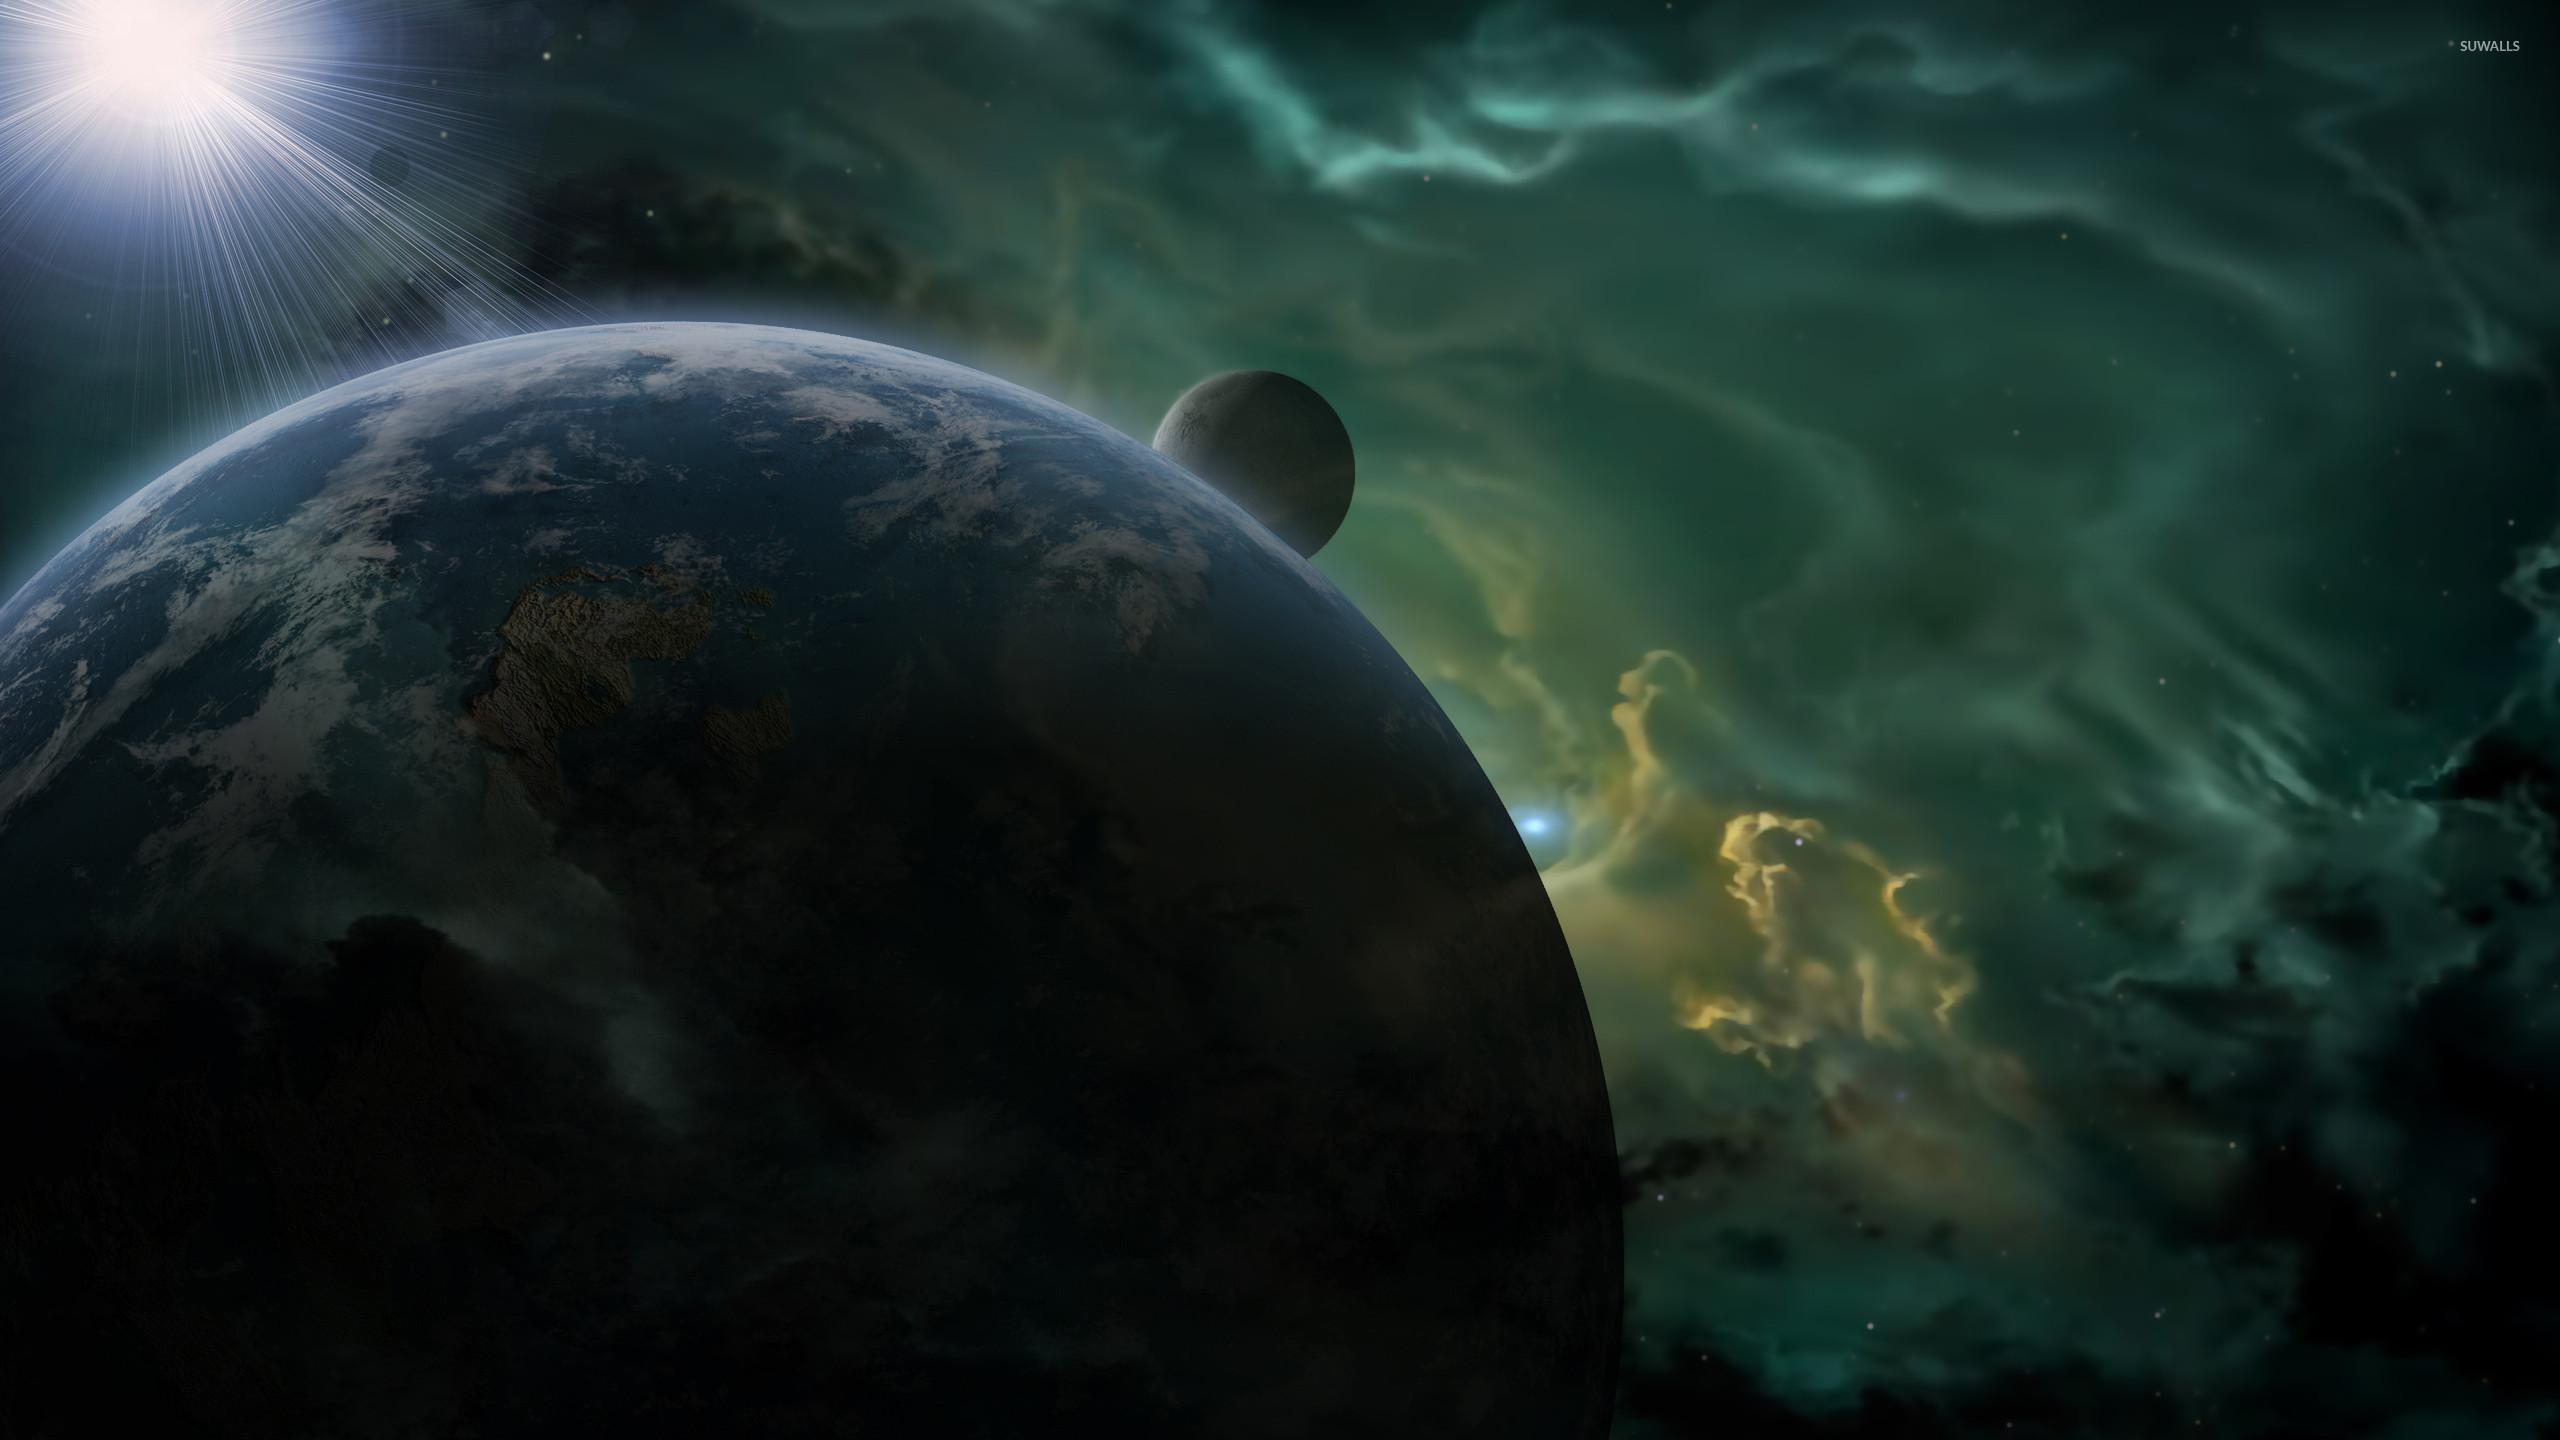 Bright light shining upon the blue planet wallpaper jpg